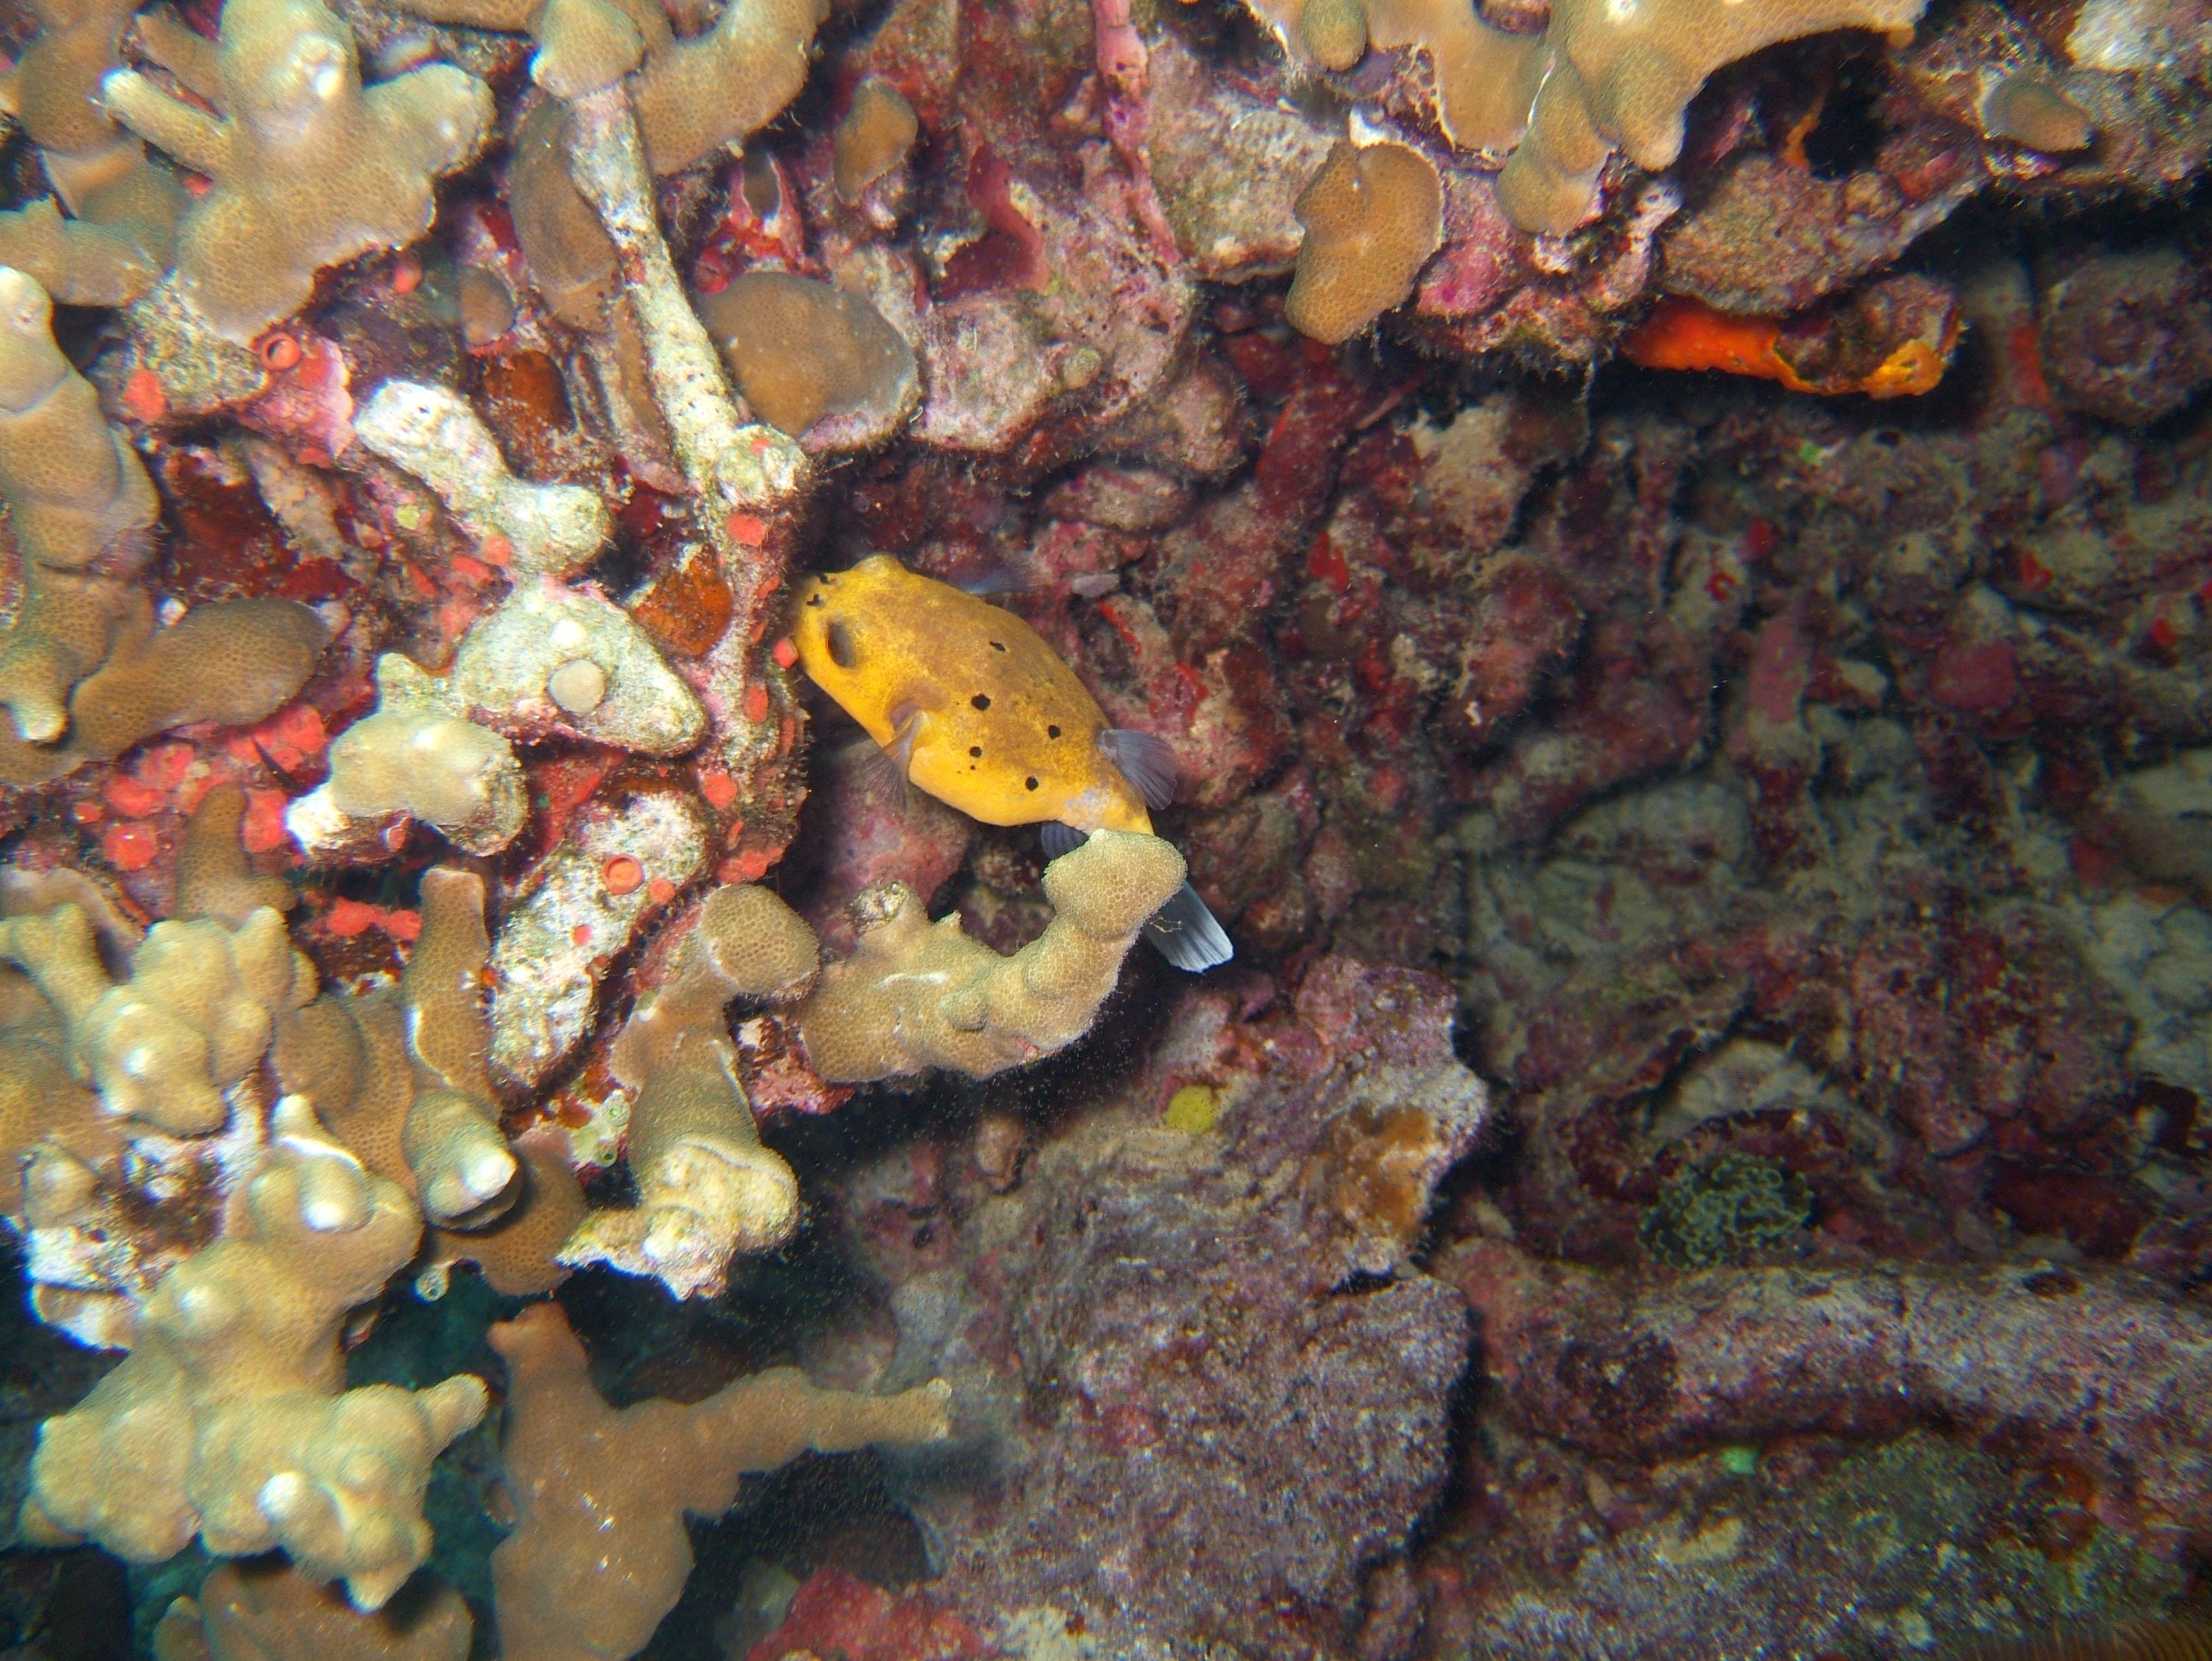 Coron dive site 11 Cay Angan Lake Baracuda Lake Reef July 2005 26